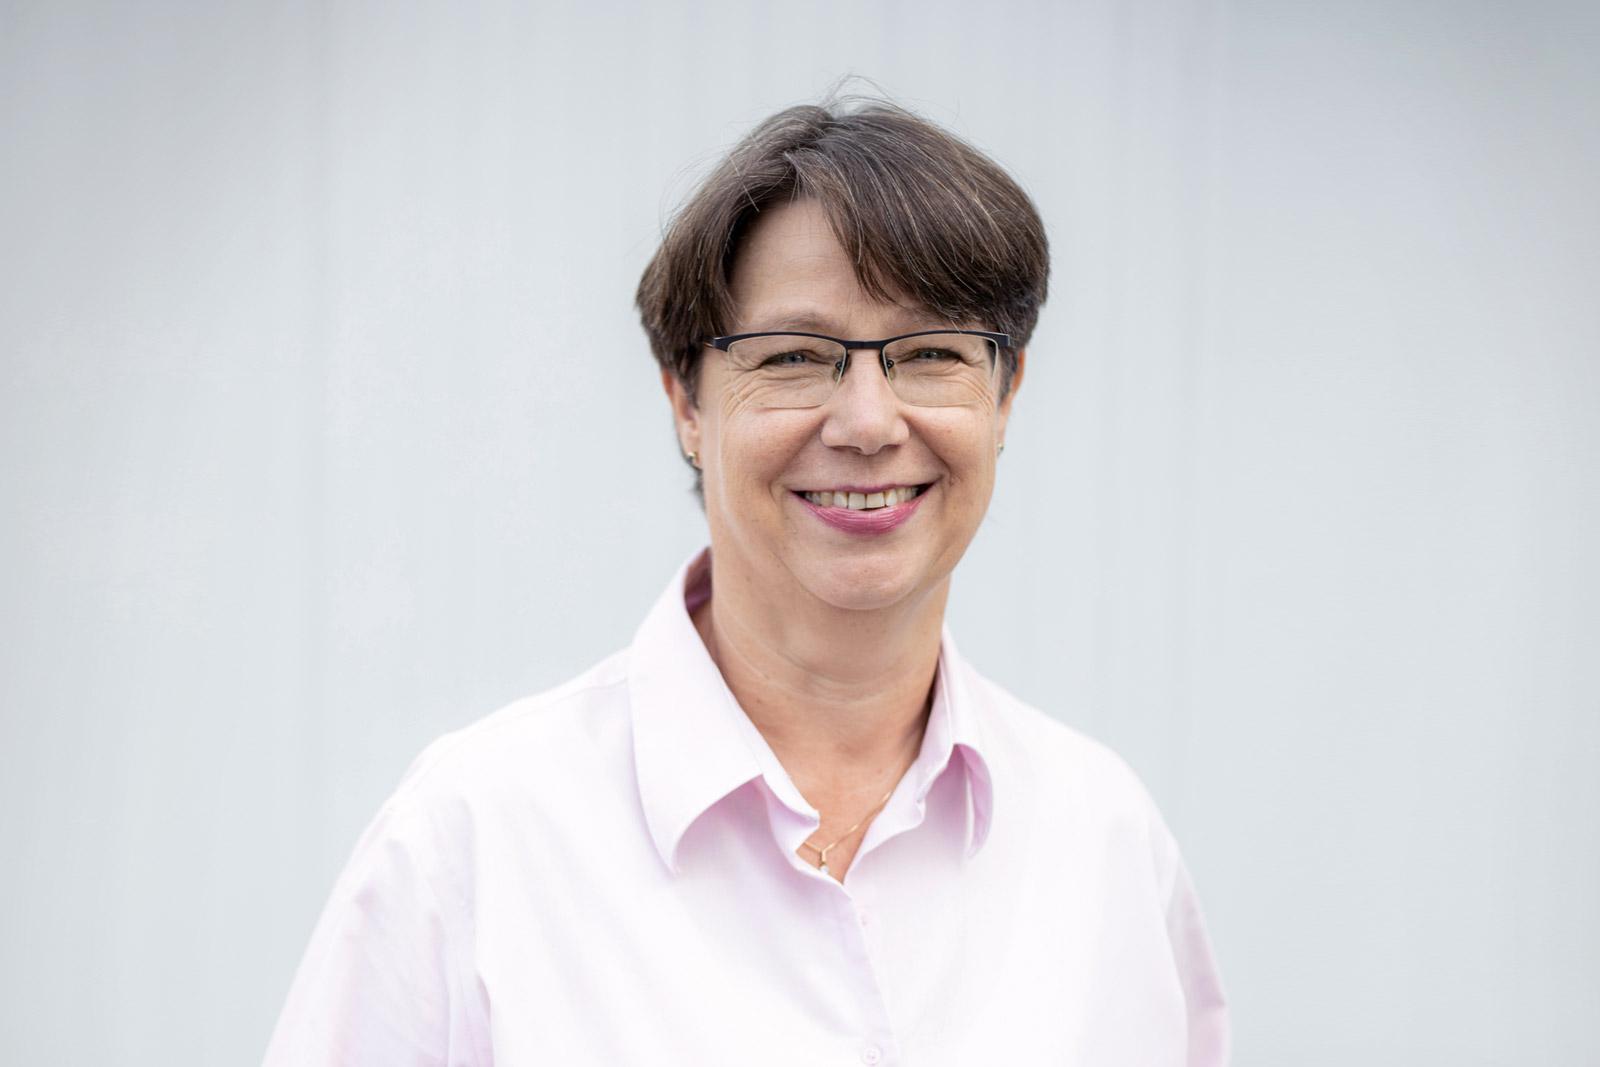 Inhaberin, Frau Thielke